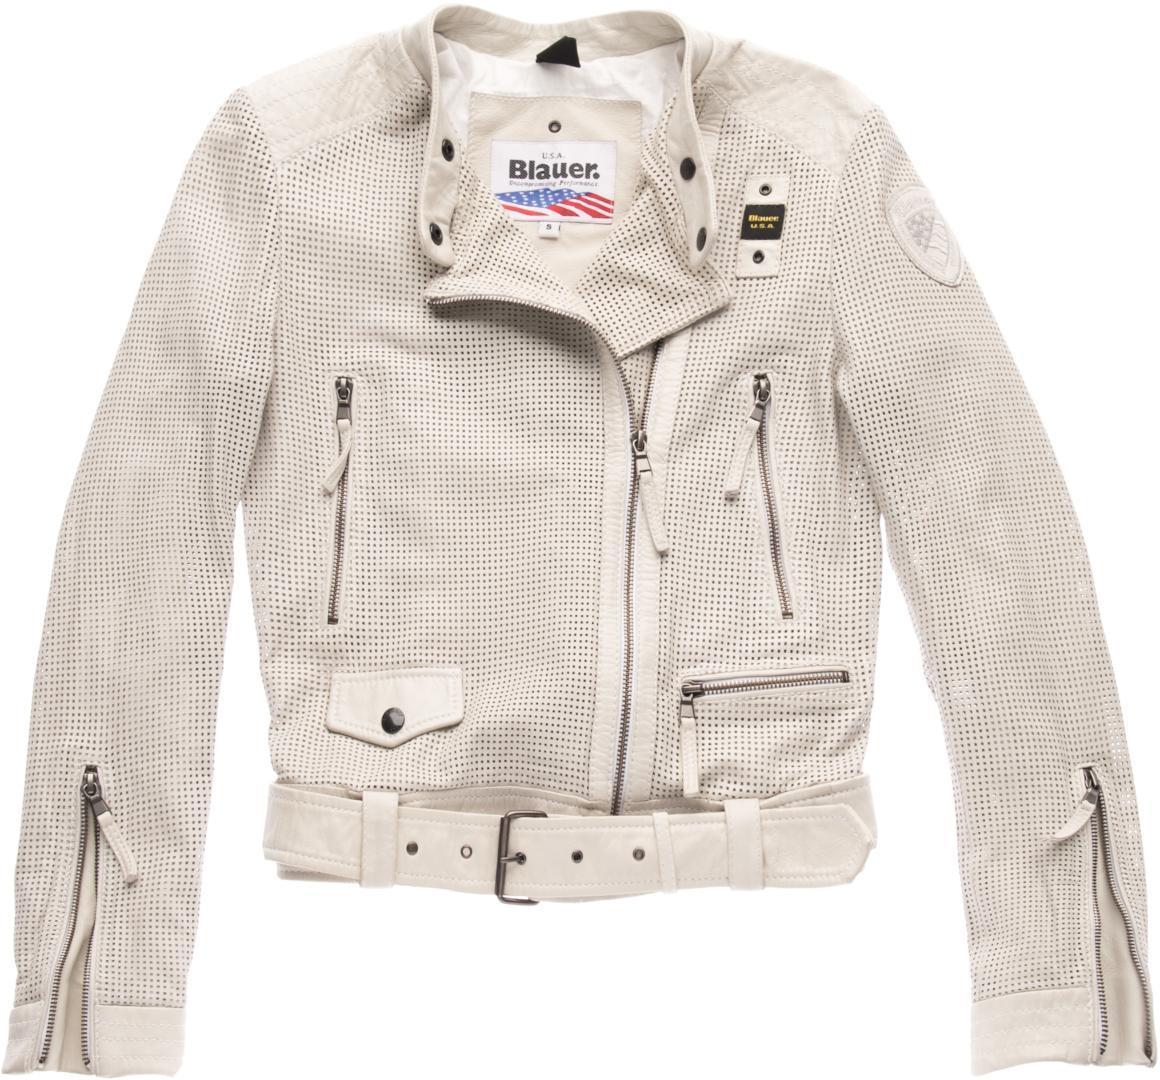 Blauer USA Moore Perforierte Damen Lederjacke, grau-beige, Größe M, grau-beige, Größe M